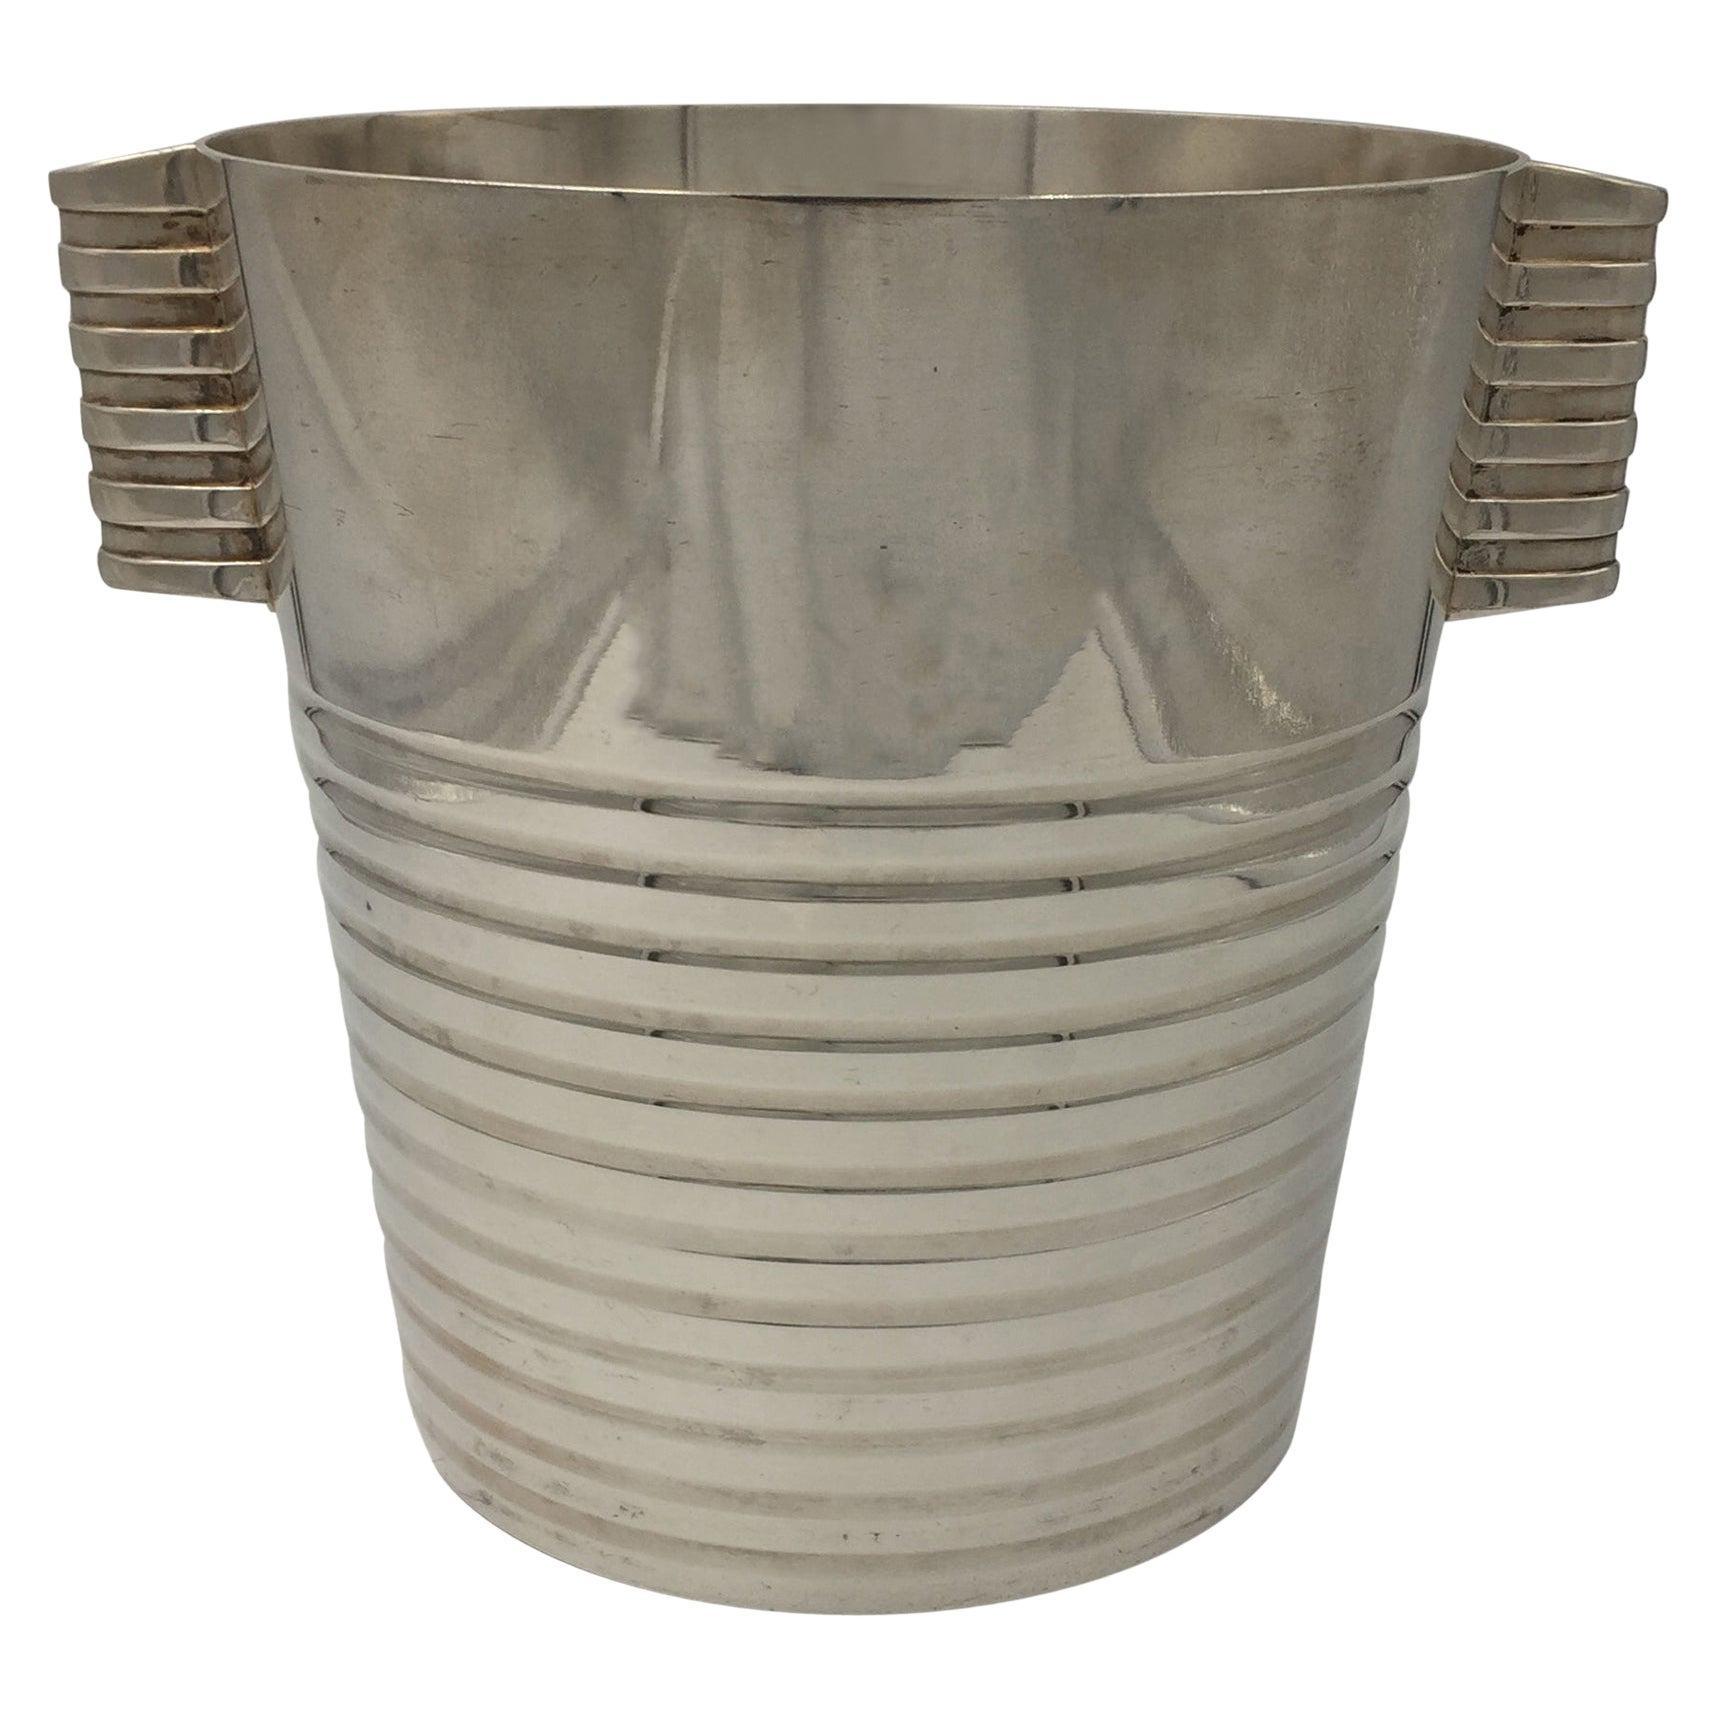 Christofle Art Deco Champagne Bucket 'Ondulations' Luc Lanel 20th